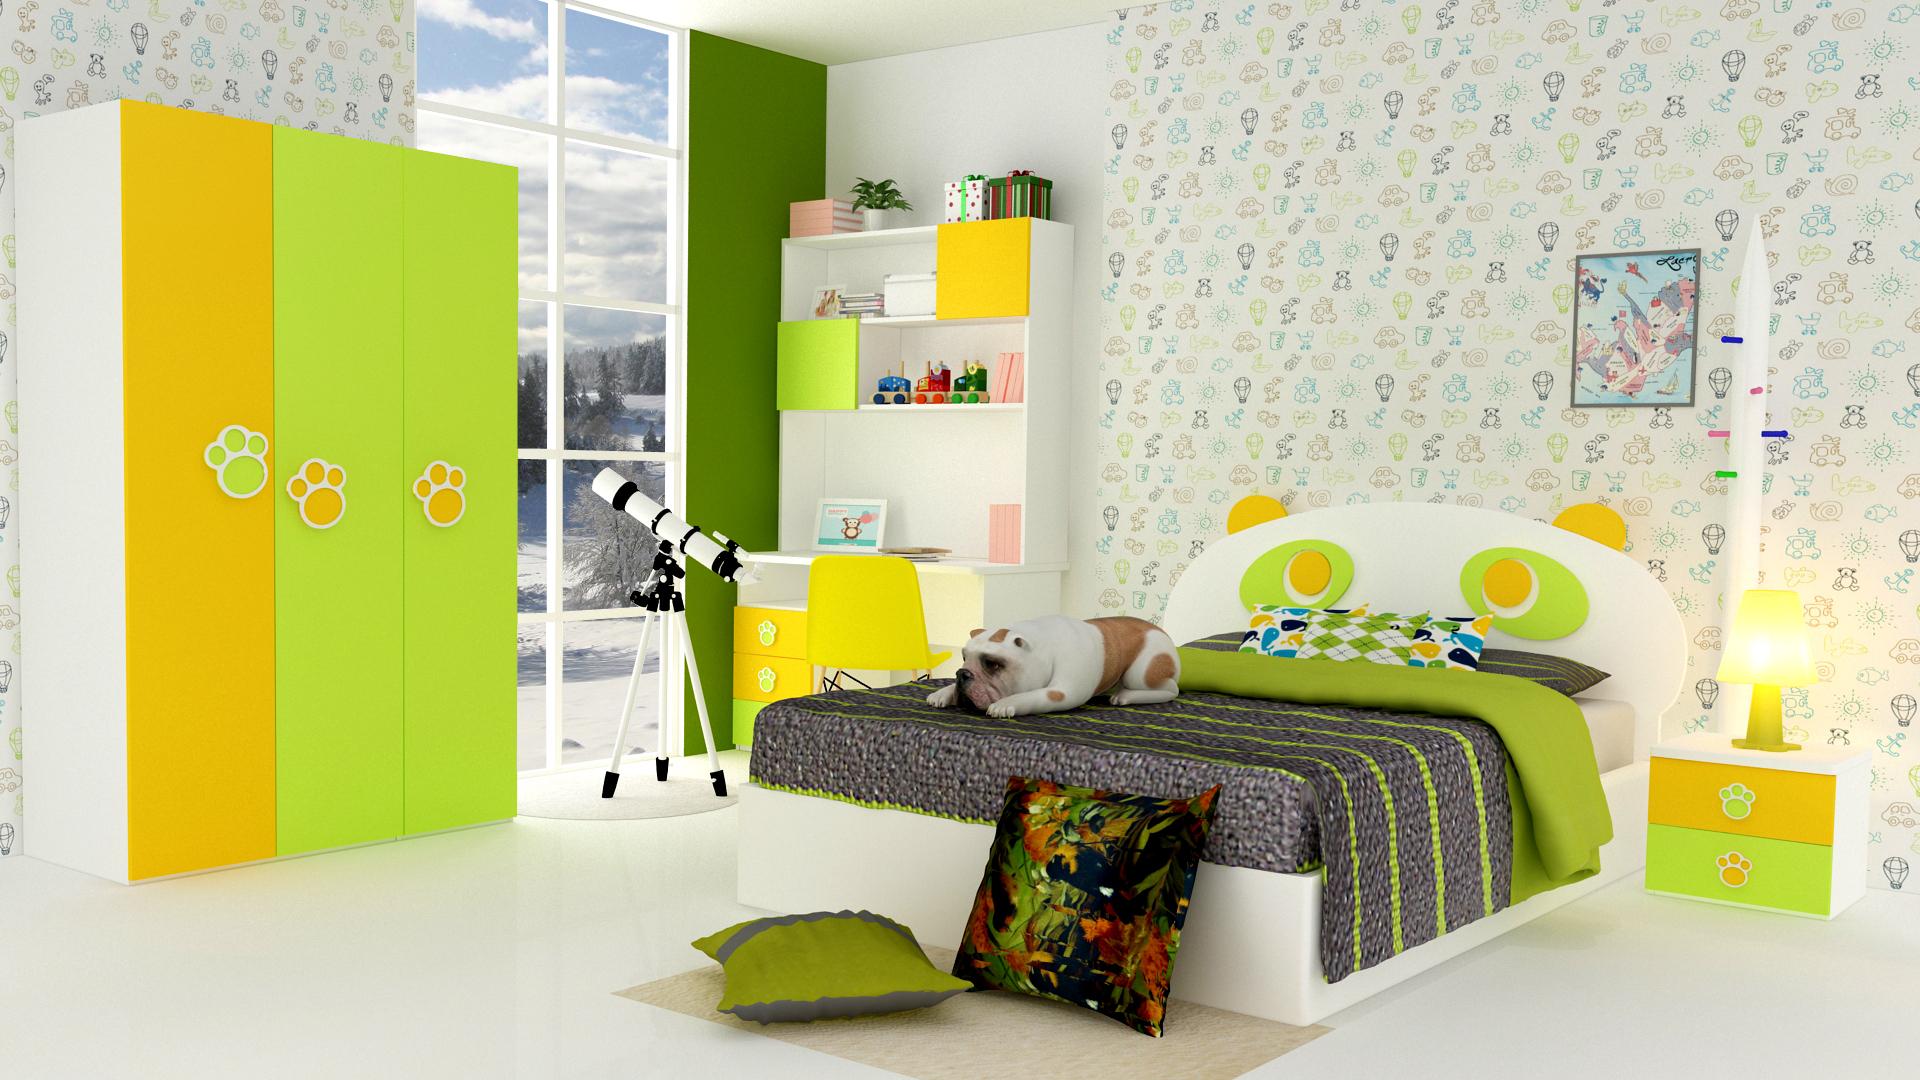 Prism decor design for Bedroom doors design catalogs